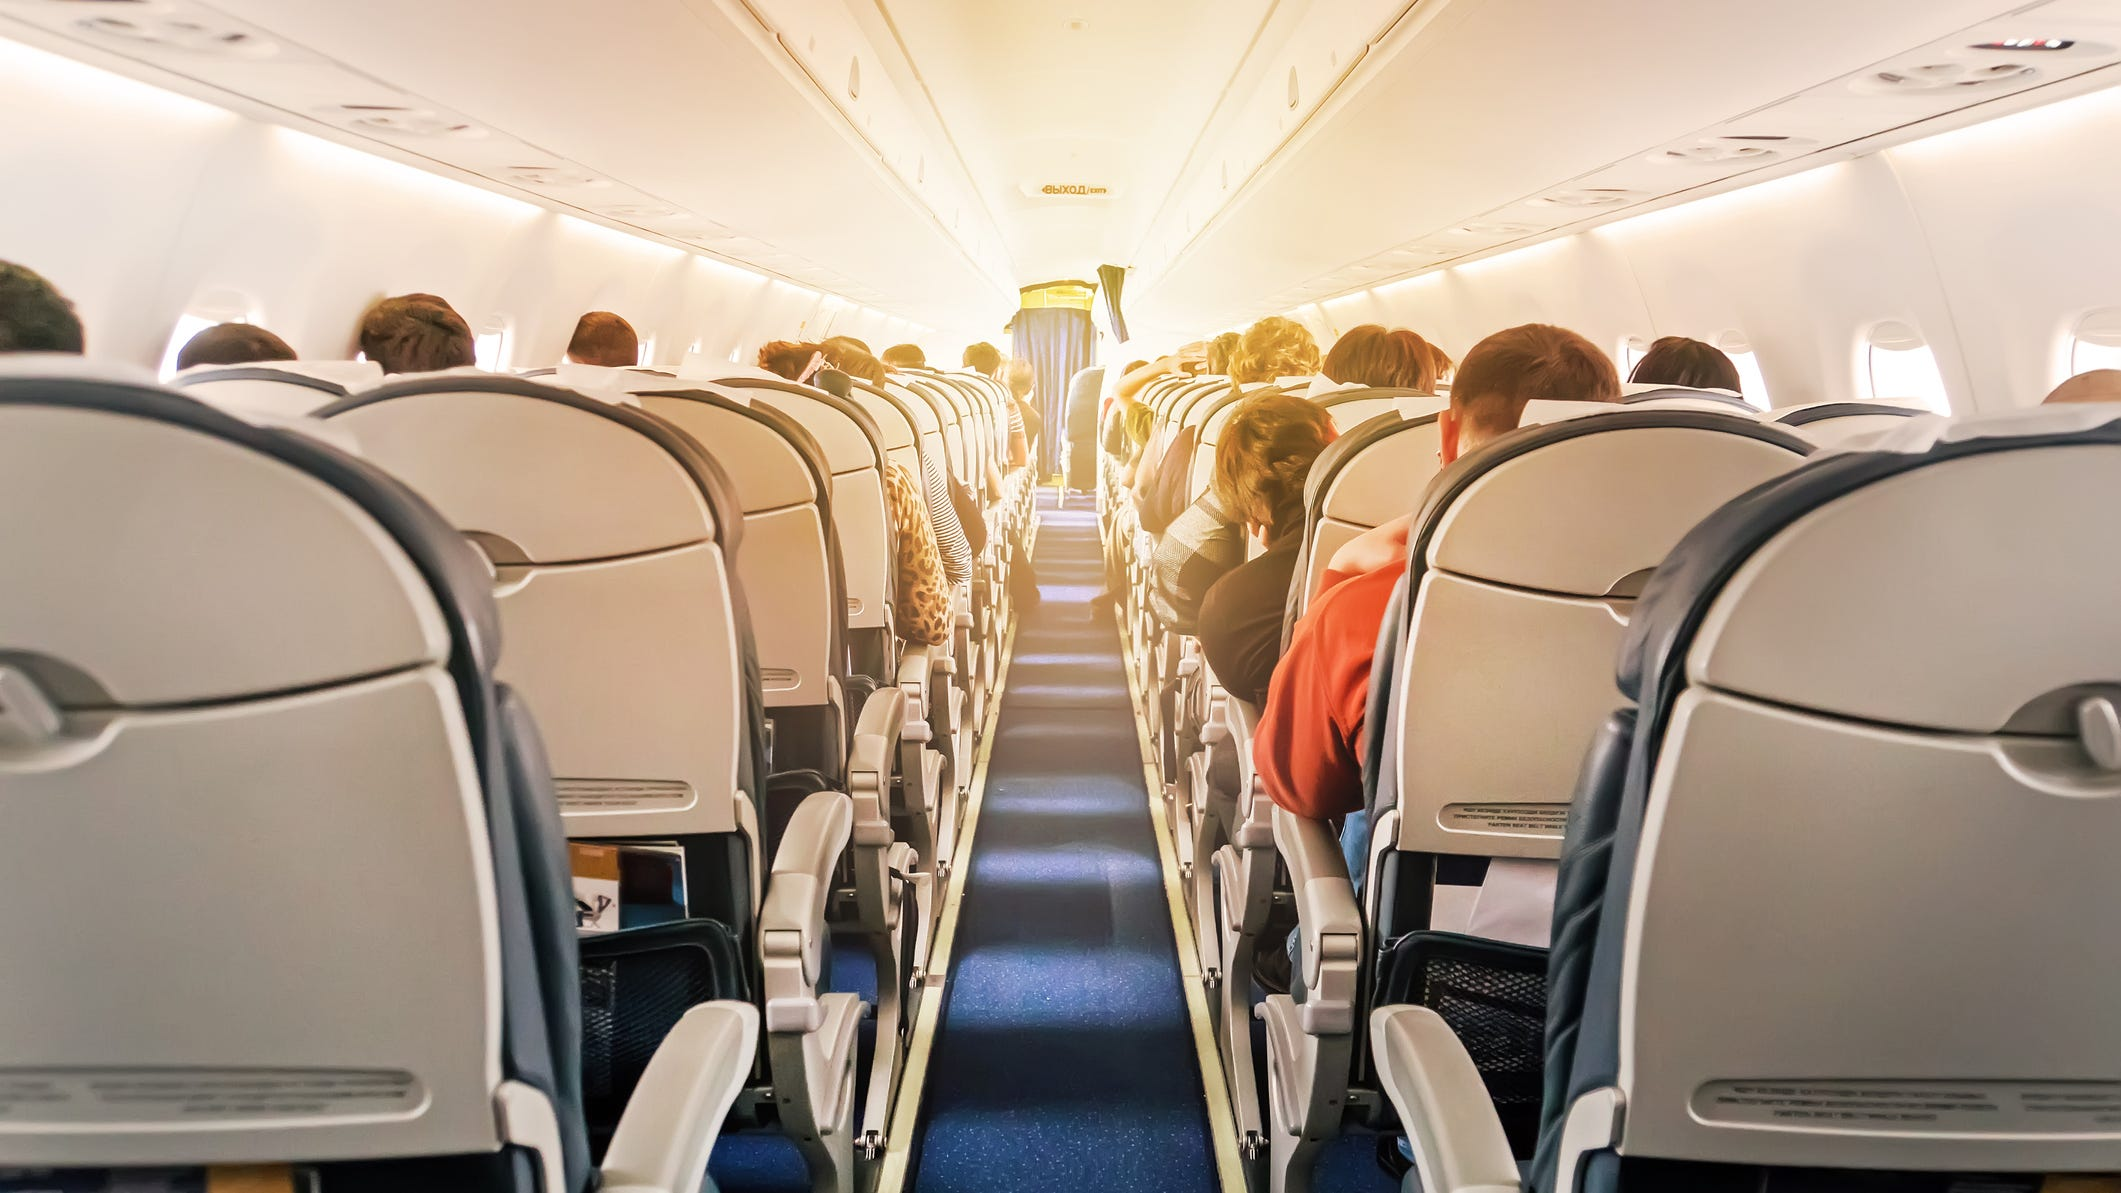 Mujer les da patadas, escupe en otros pasajeros durante pleito en avión sobre mascarillas